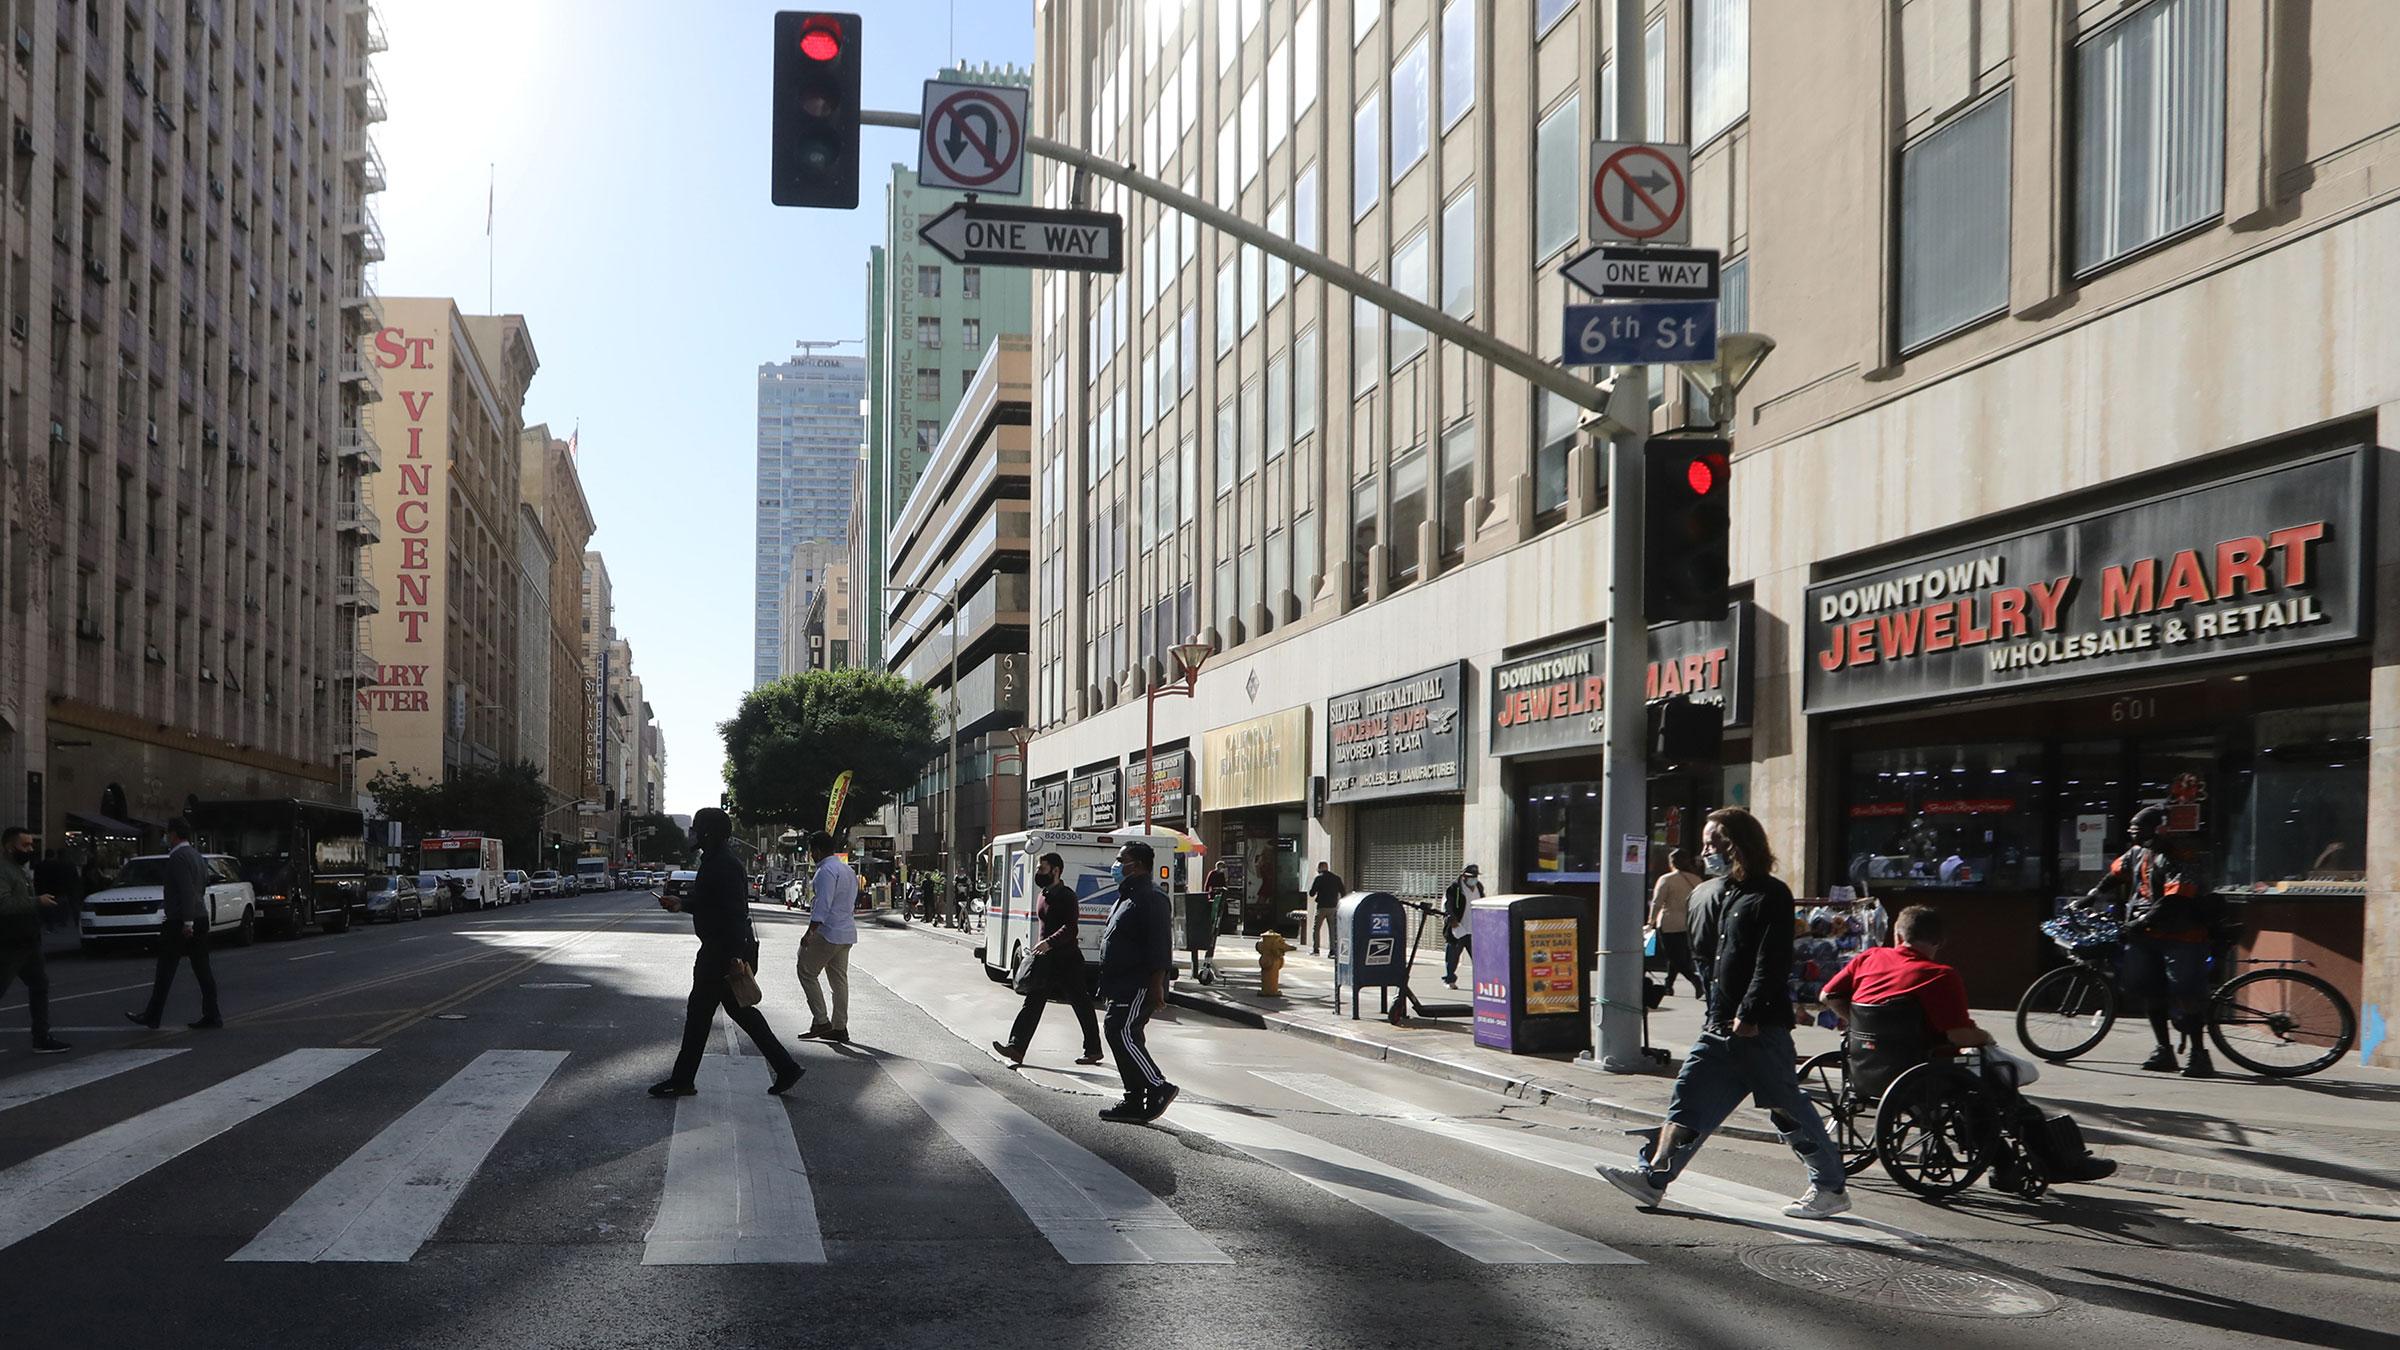 Pedestrians cross a street in downtown Los Angeles, on Thursday, December 3.